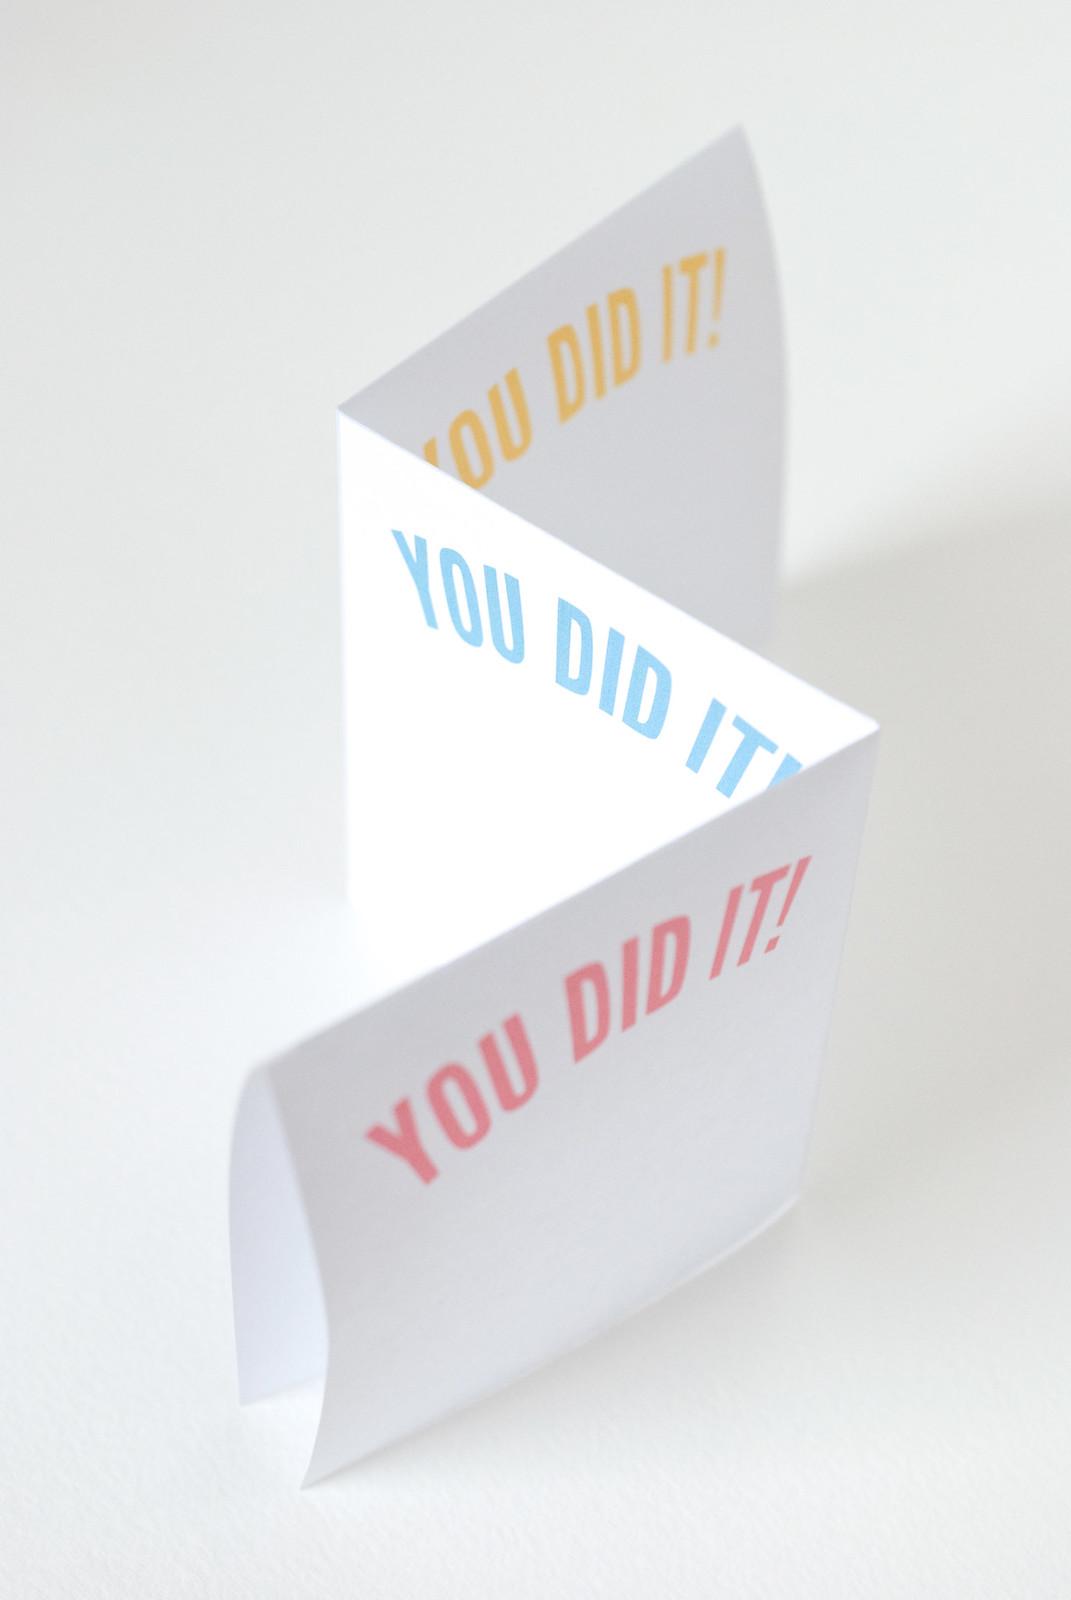 You Did It lists printable